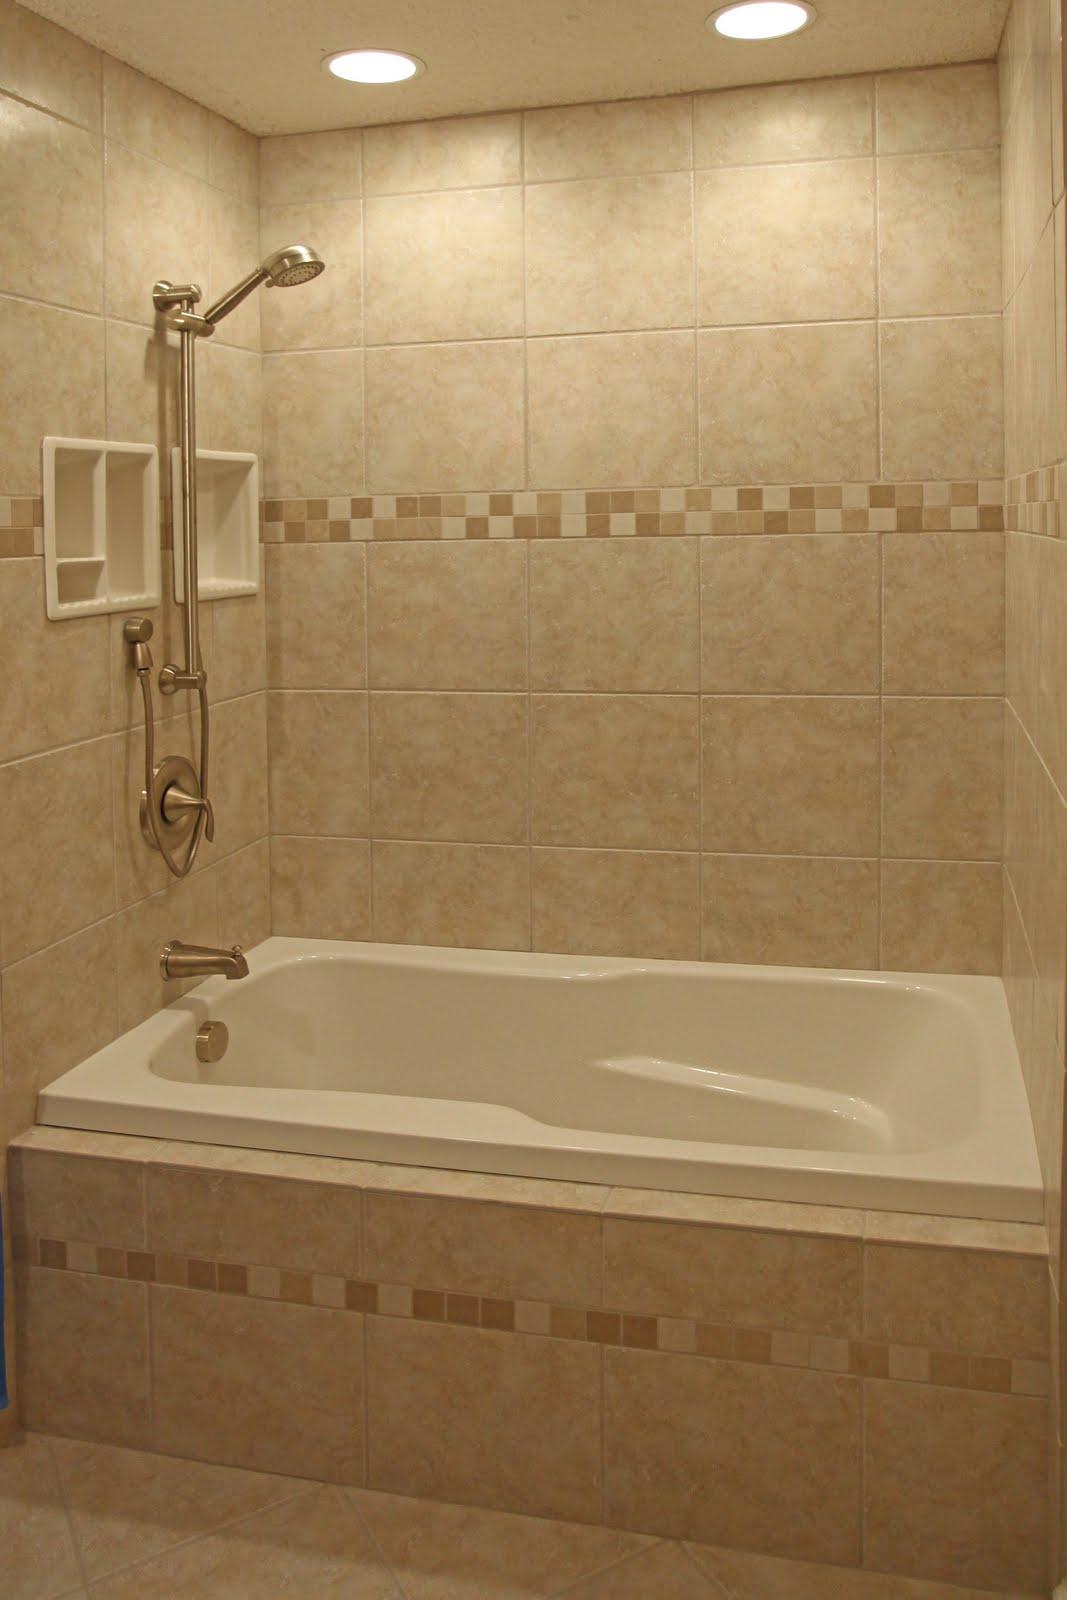 Bathroom remodeling design ideas tile shower niches - Small bathroom tiles design ...